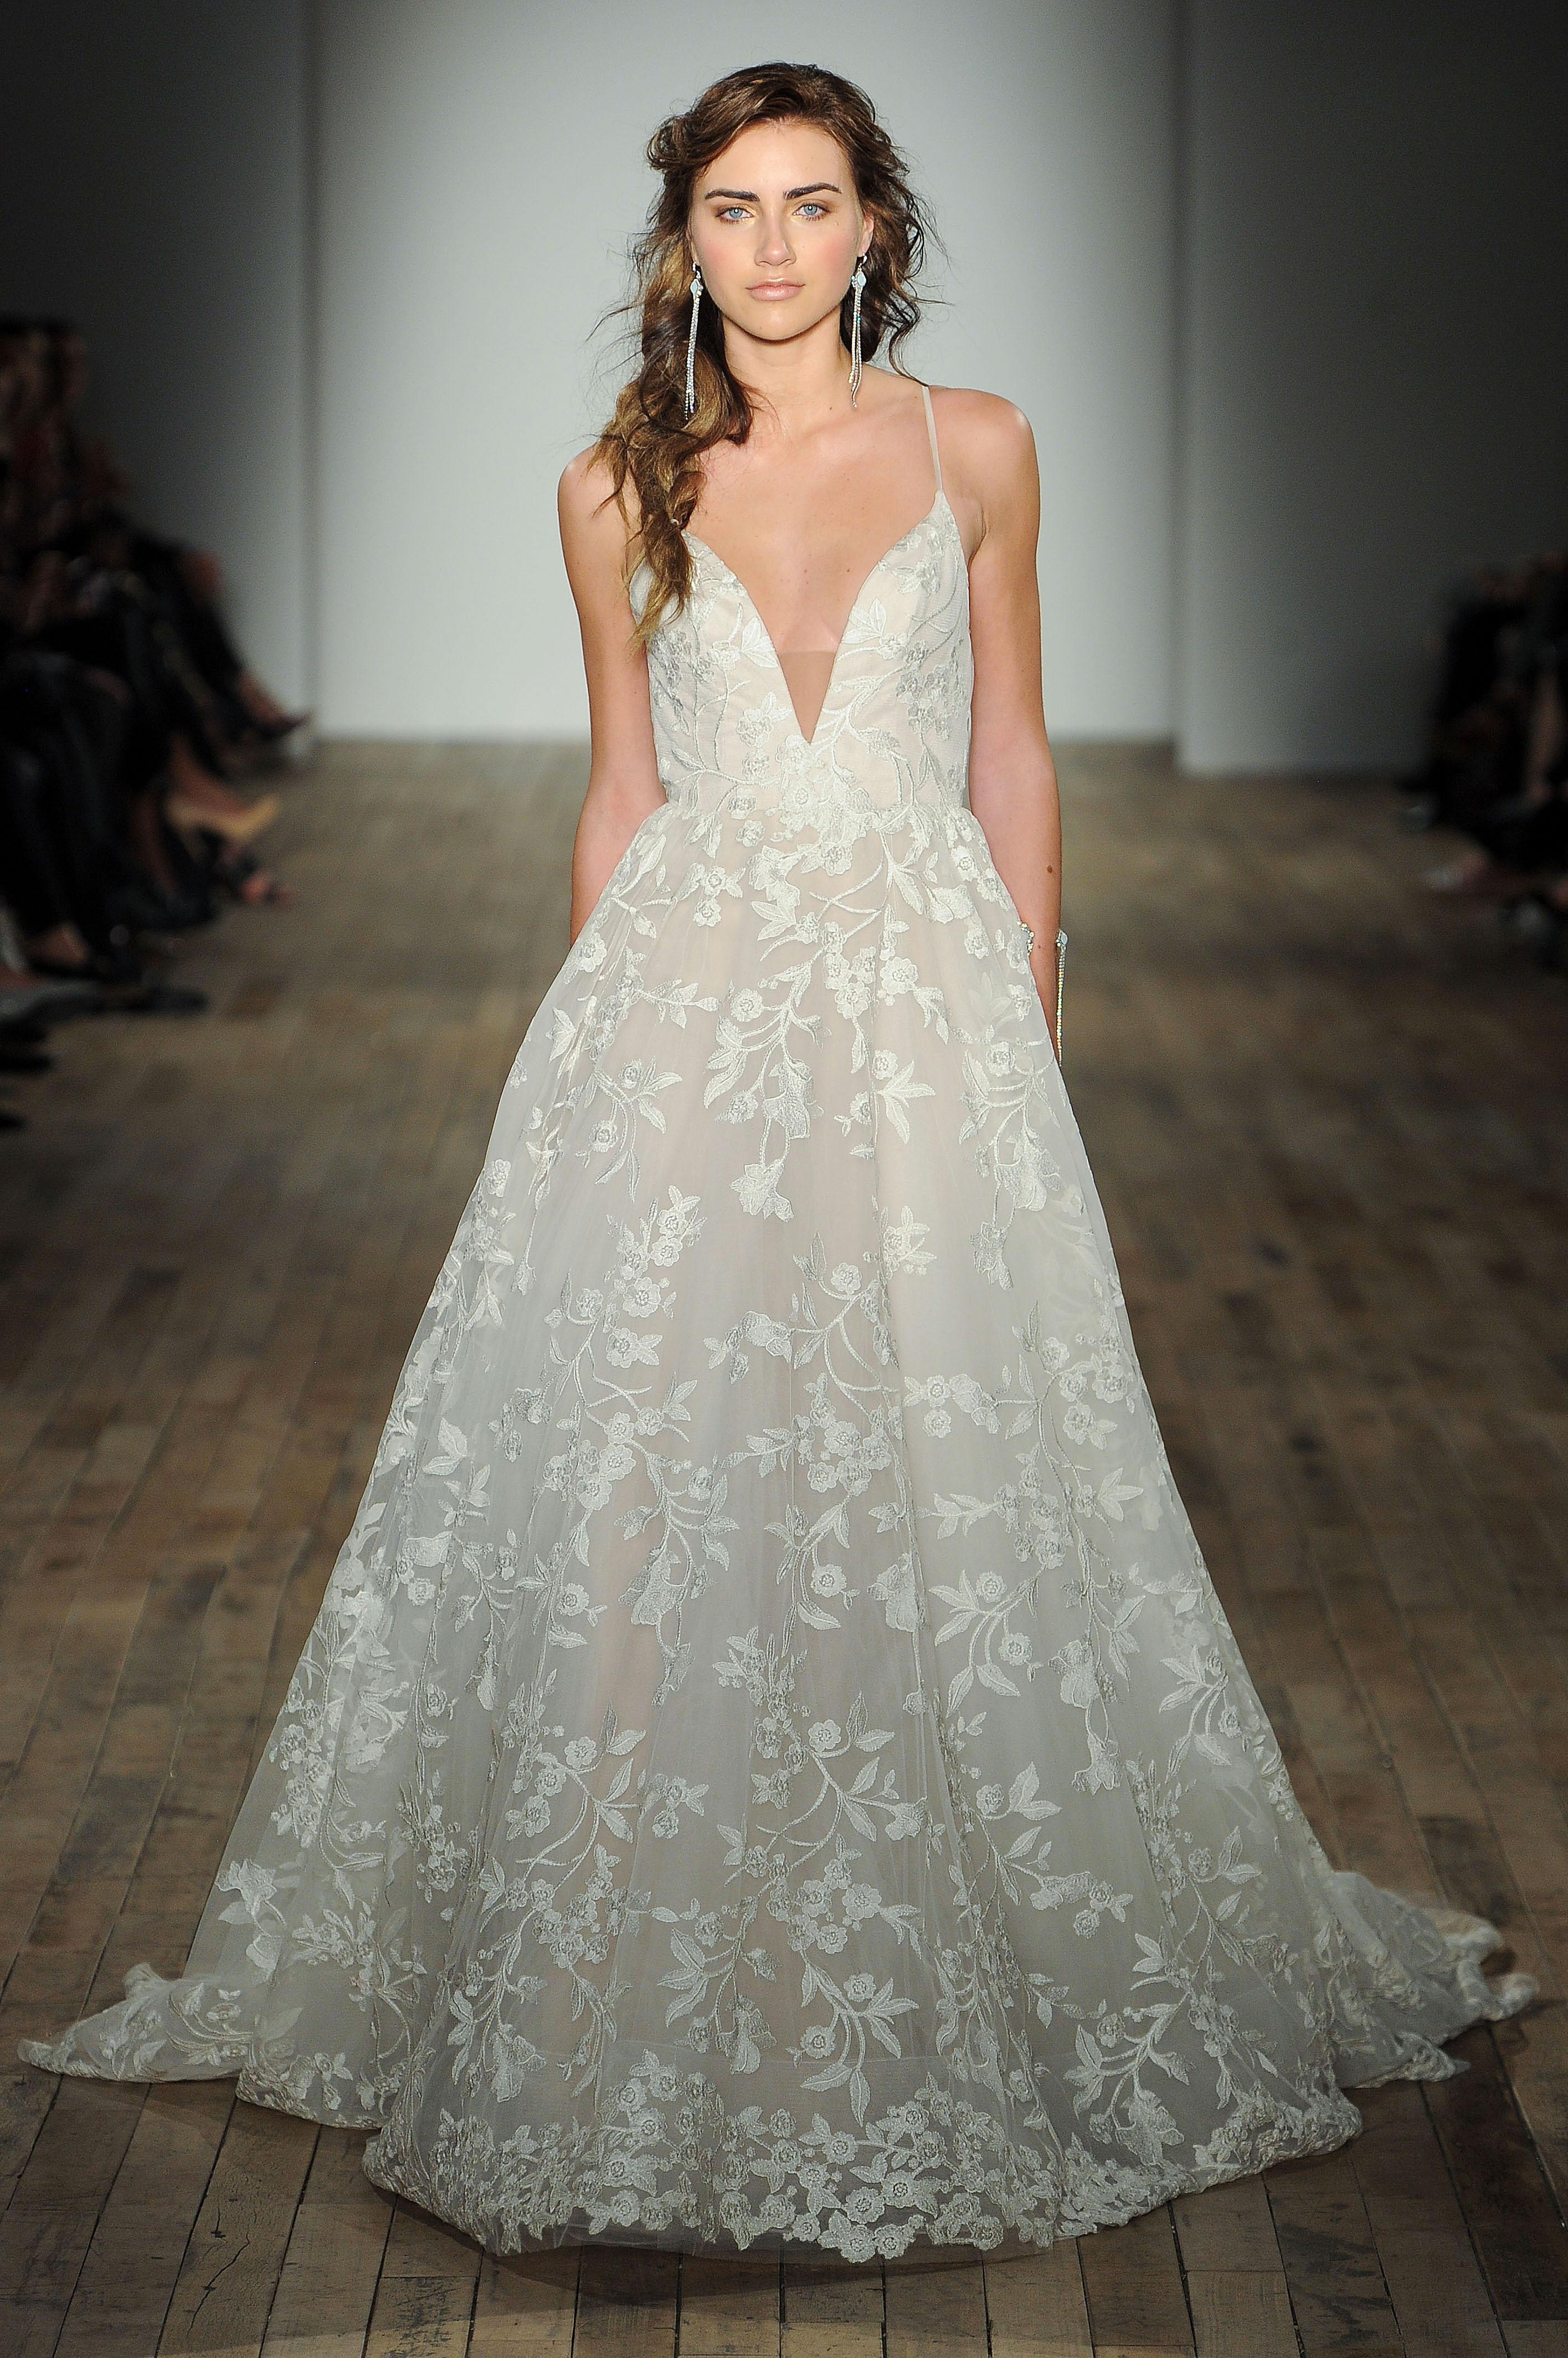 Jim Heljm Wedding Dresses.Jim Hjelm By Hayley Paige Spring 2018 Wedding Dress